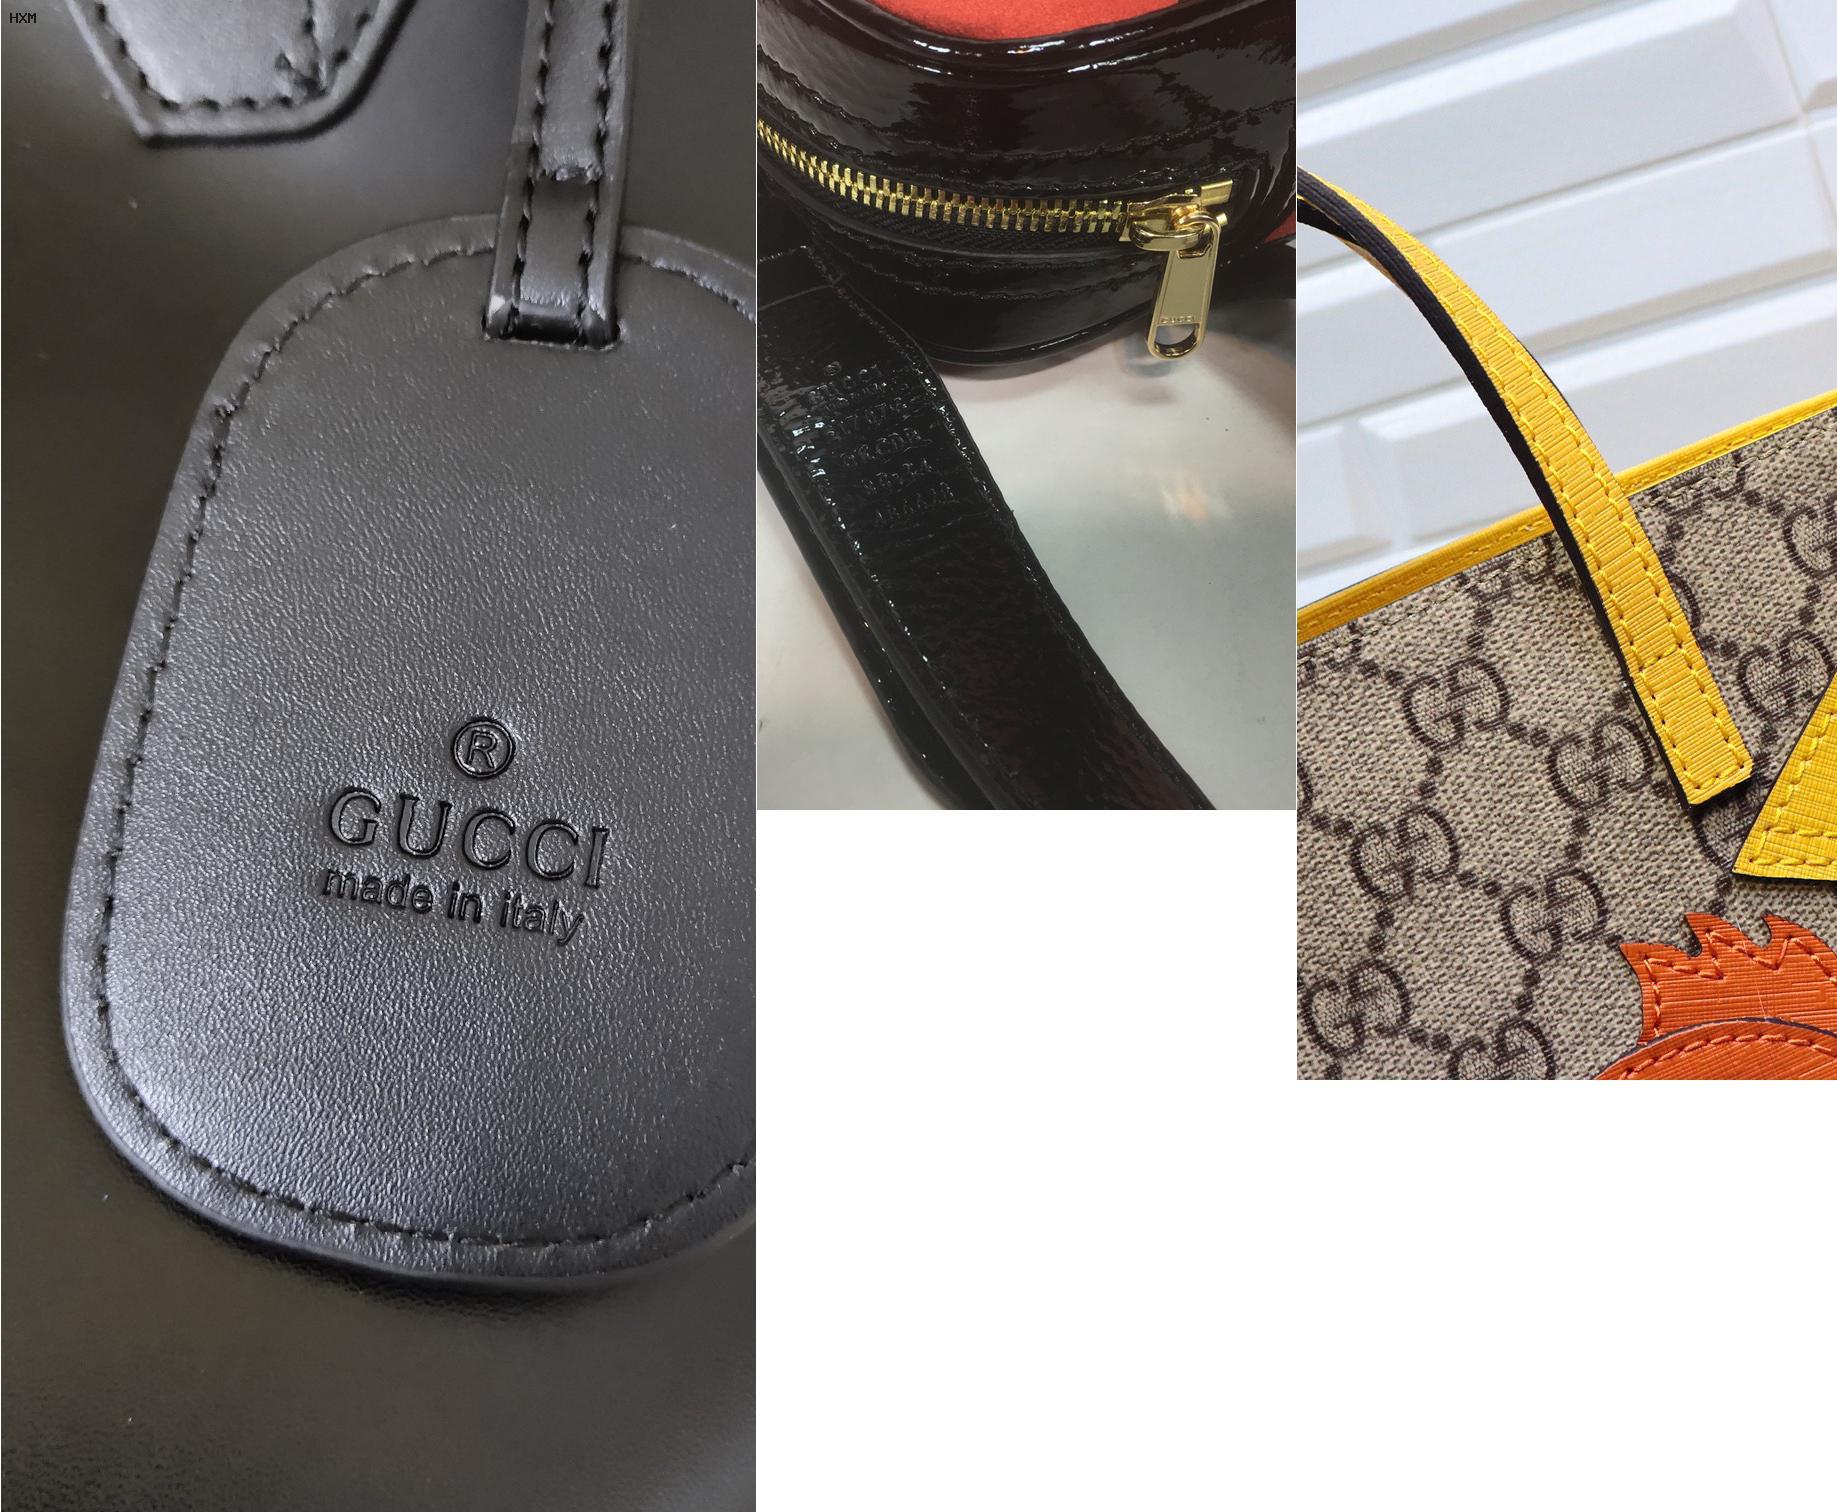 cinturon gucci mujer precio colombia